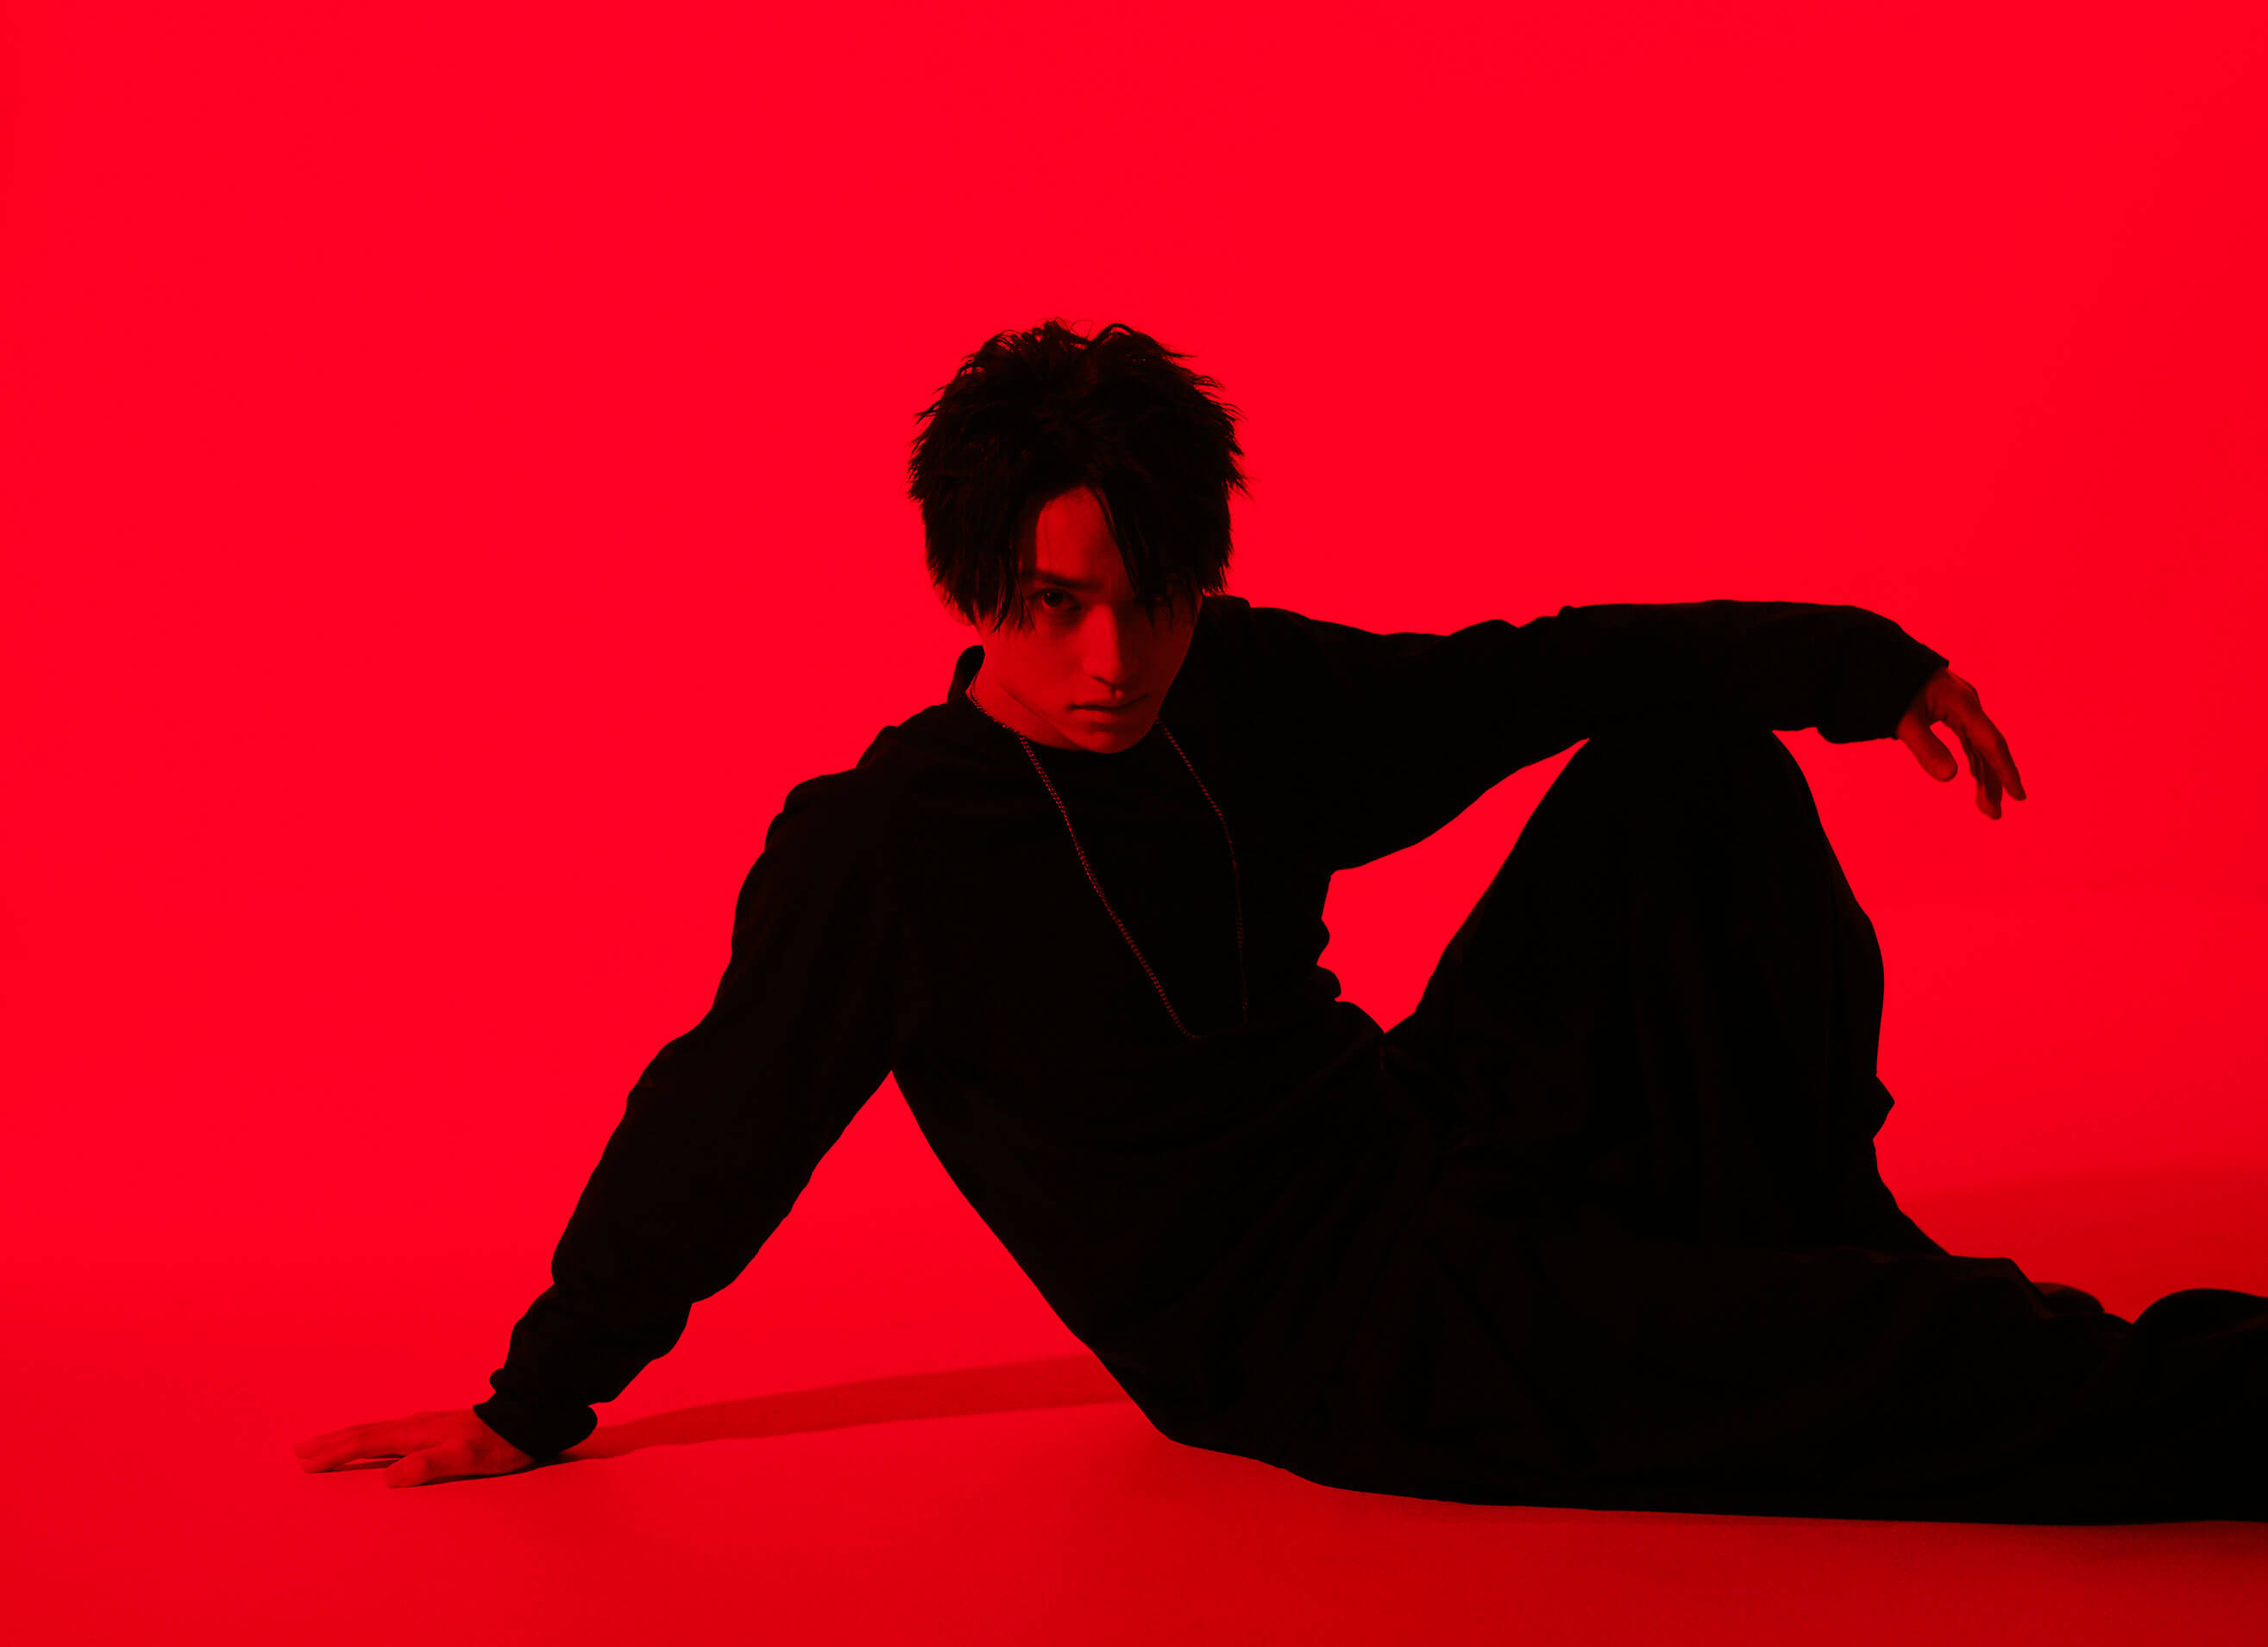 SKY-HI專輯收錄曲「What a Wonderful World!!」與SERGIO MENDES合作 skyhi、